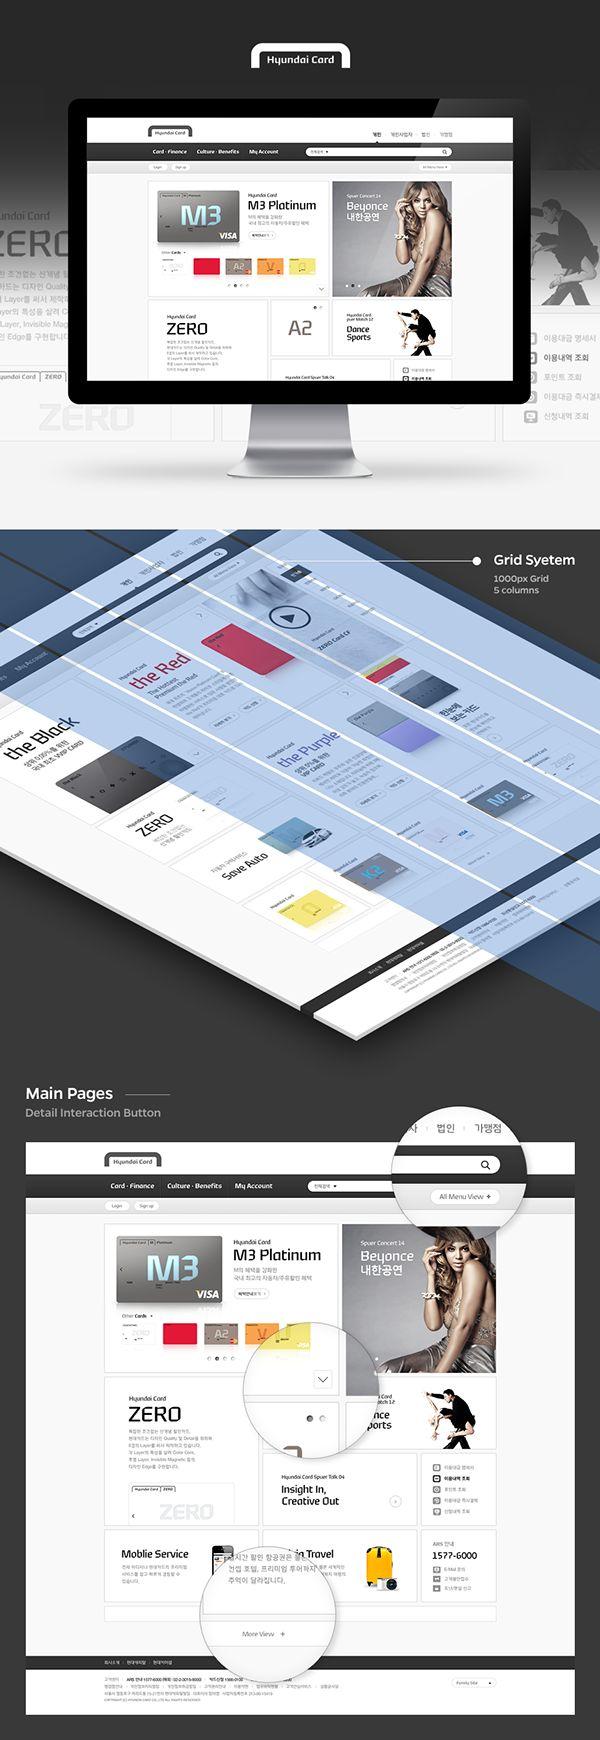 Hyundai Card Website Concept Design by youngha choi, via Behance